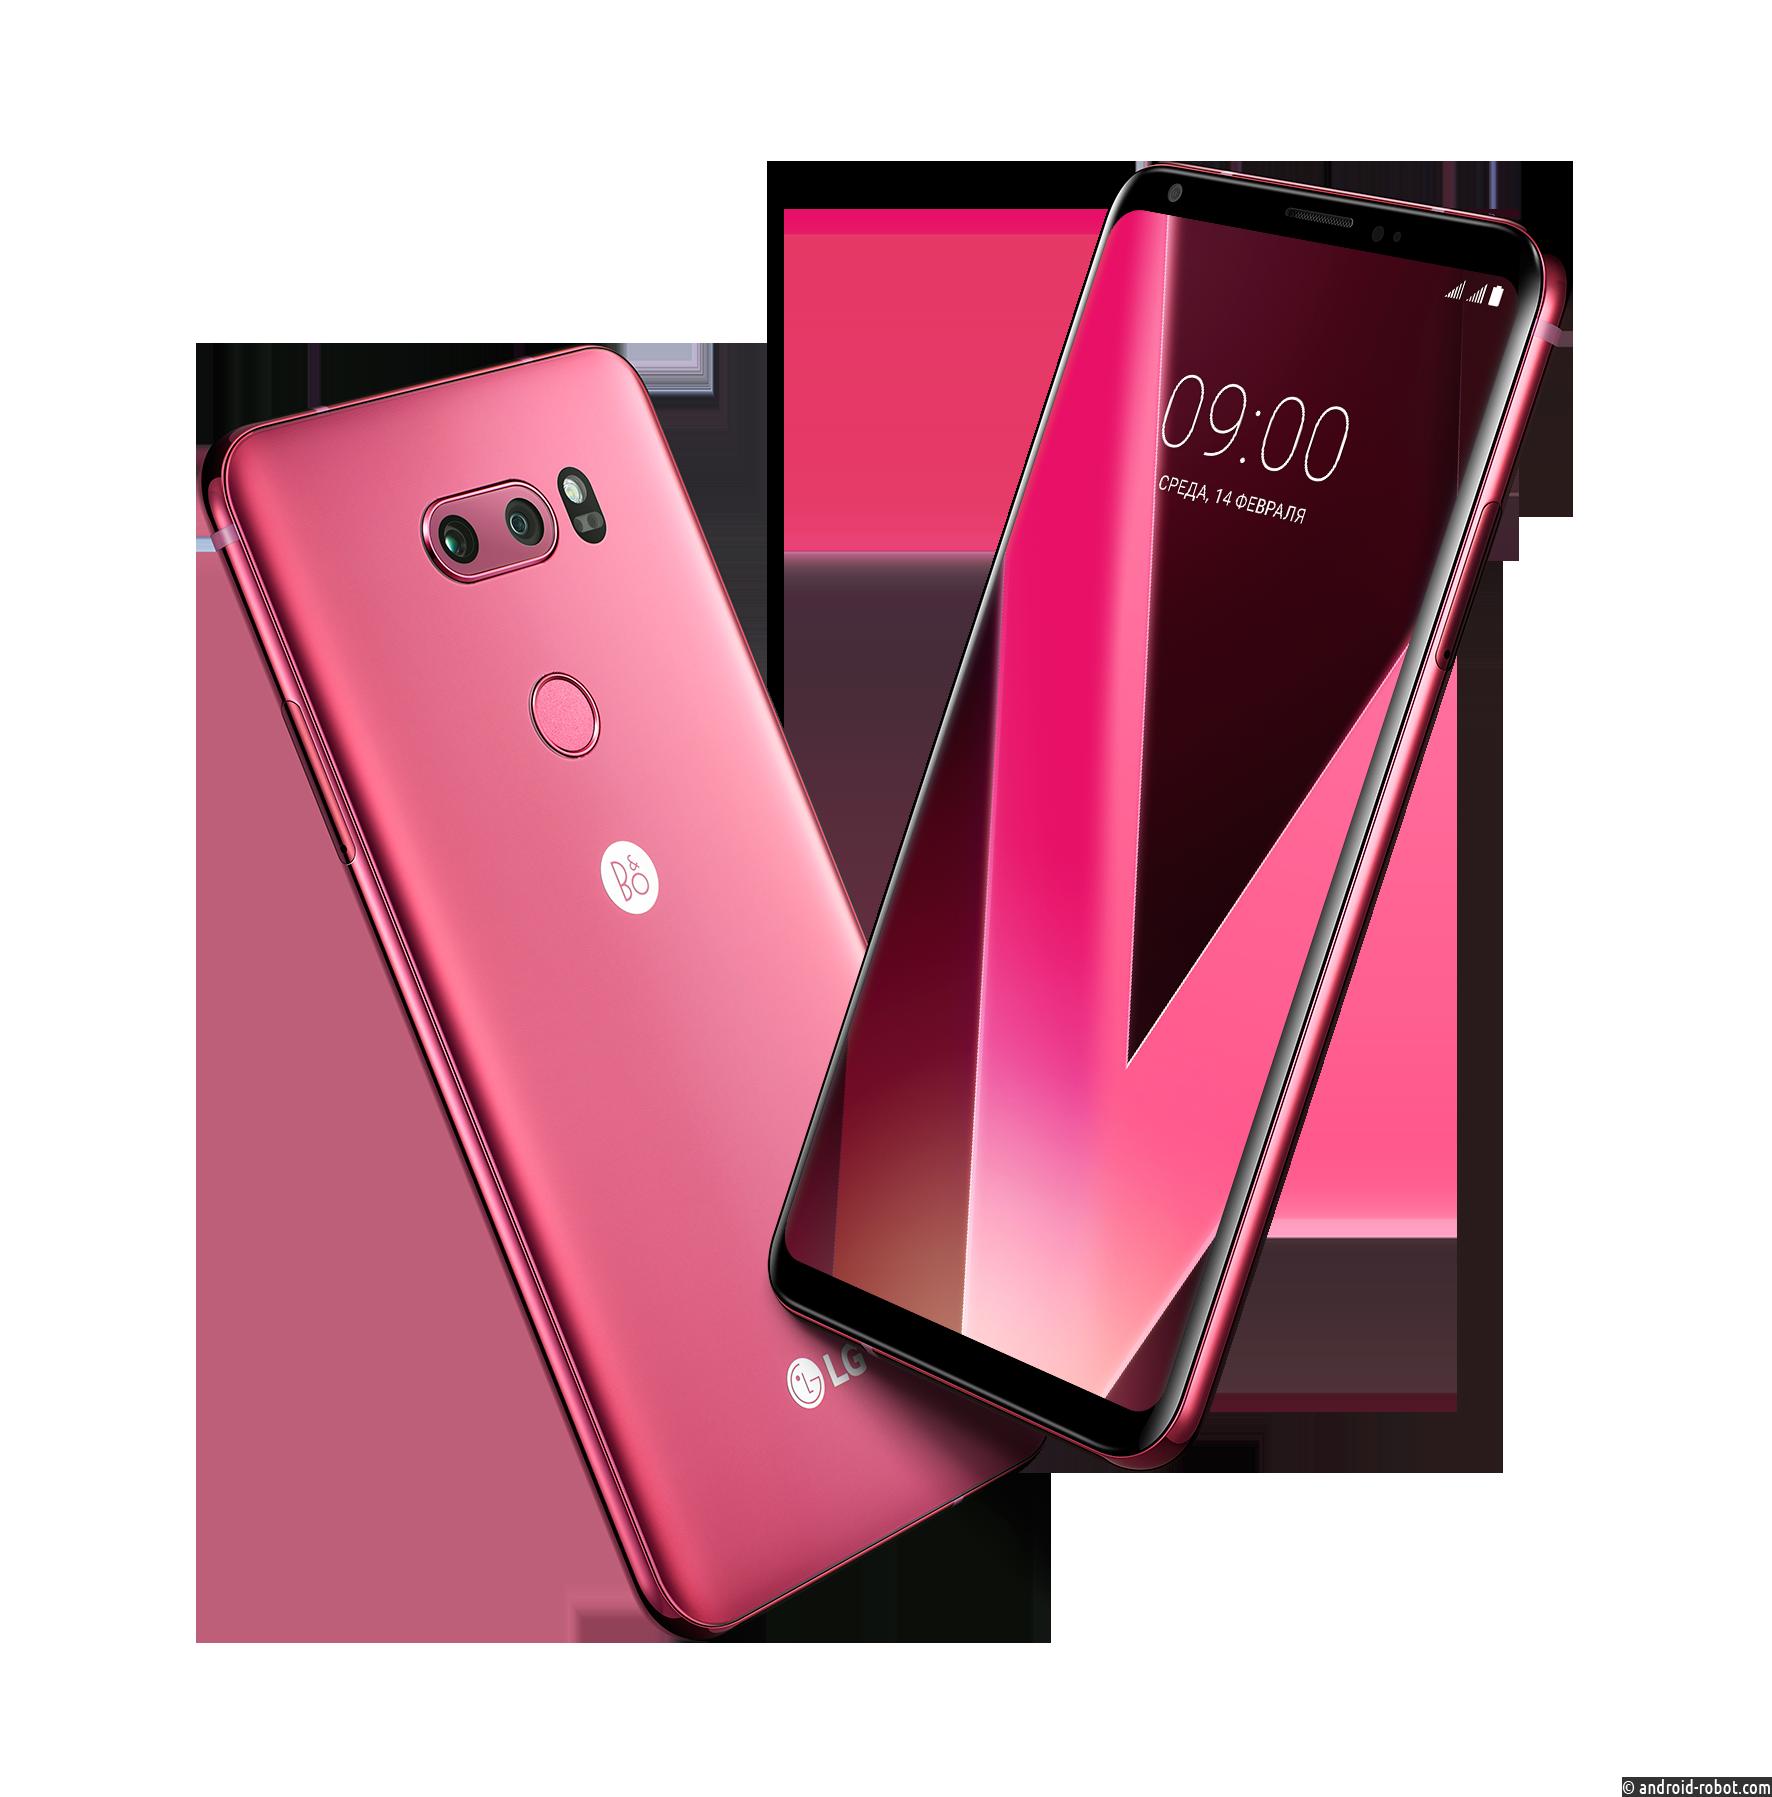 Представлен смартфон  LG V30+ в новом малиновом цвете